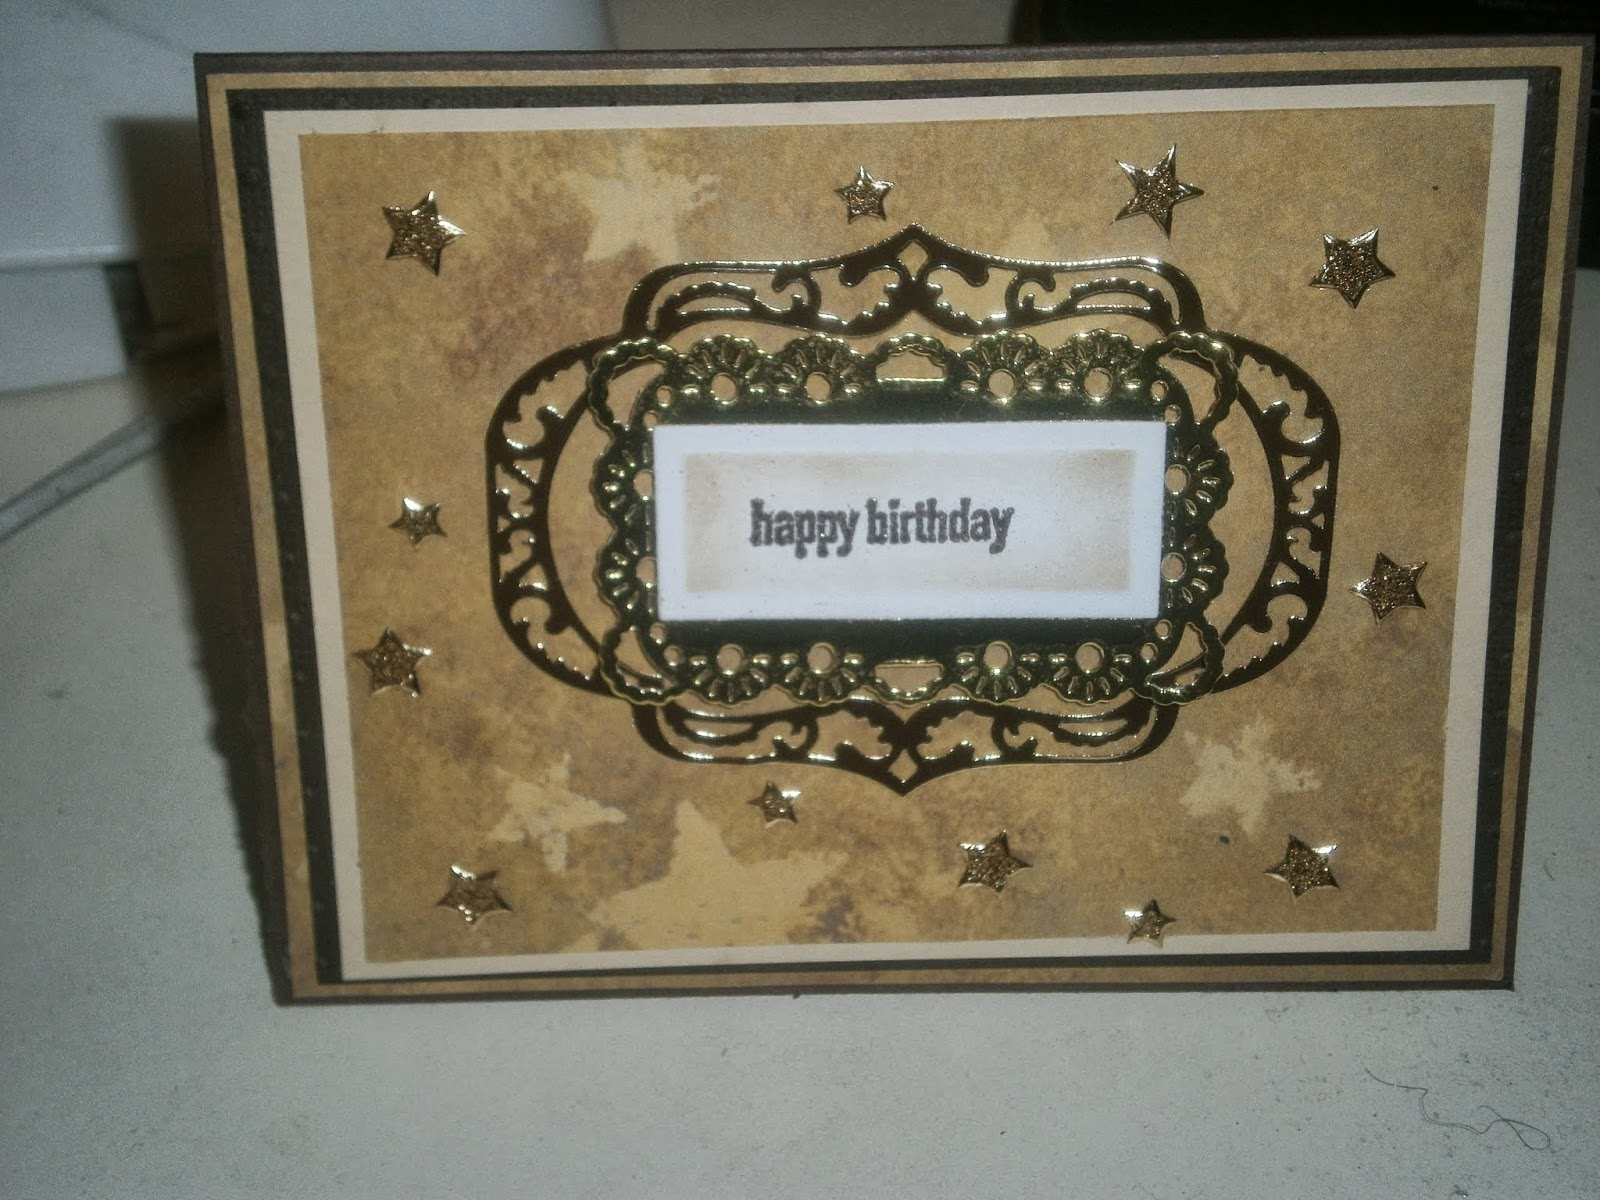 Happy Birthday In Heaven Brother Scrappin 2 heaven: happy birthday ...